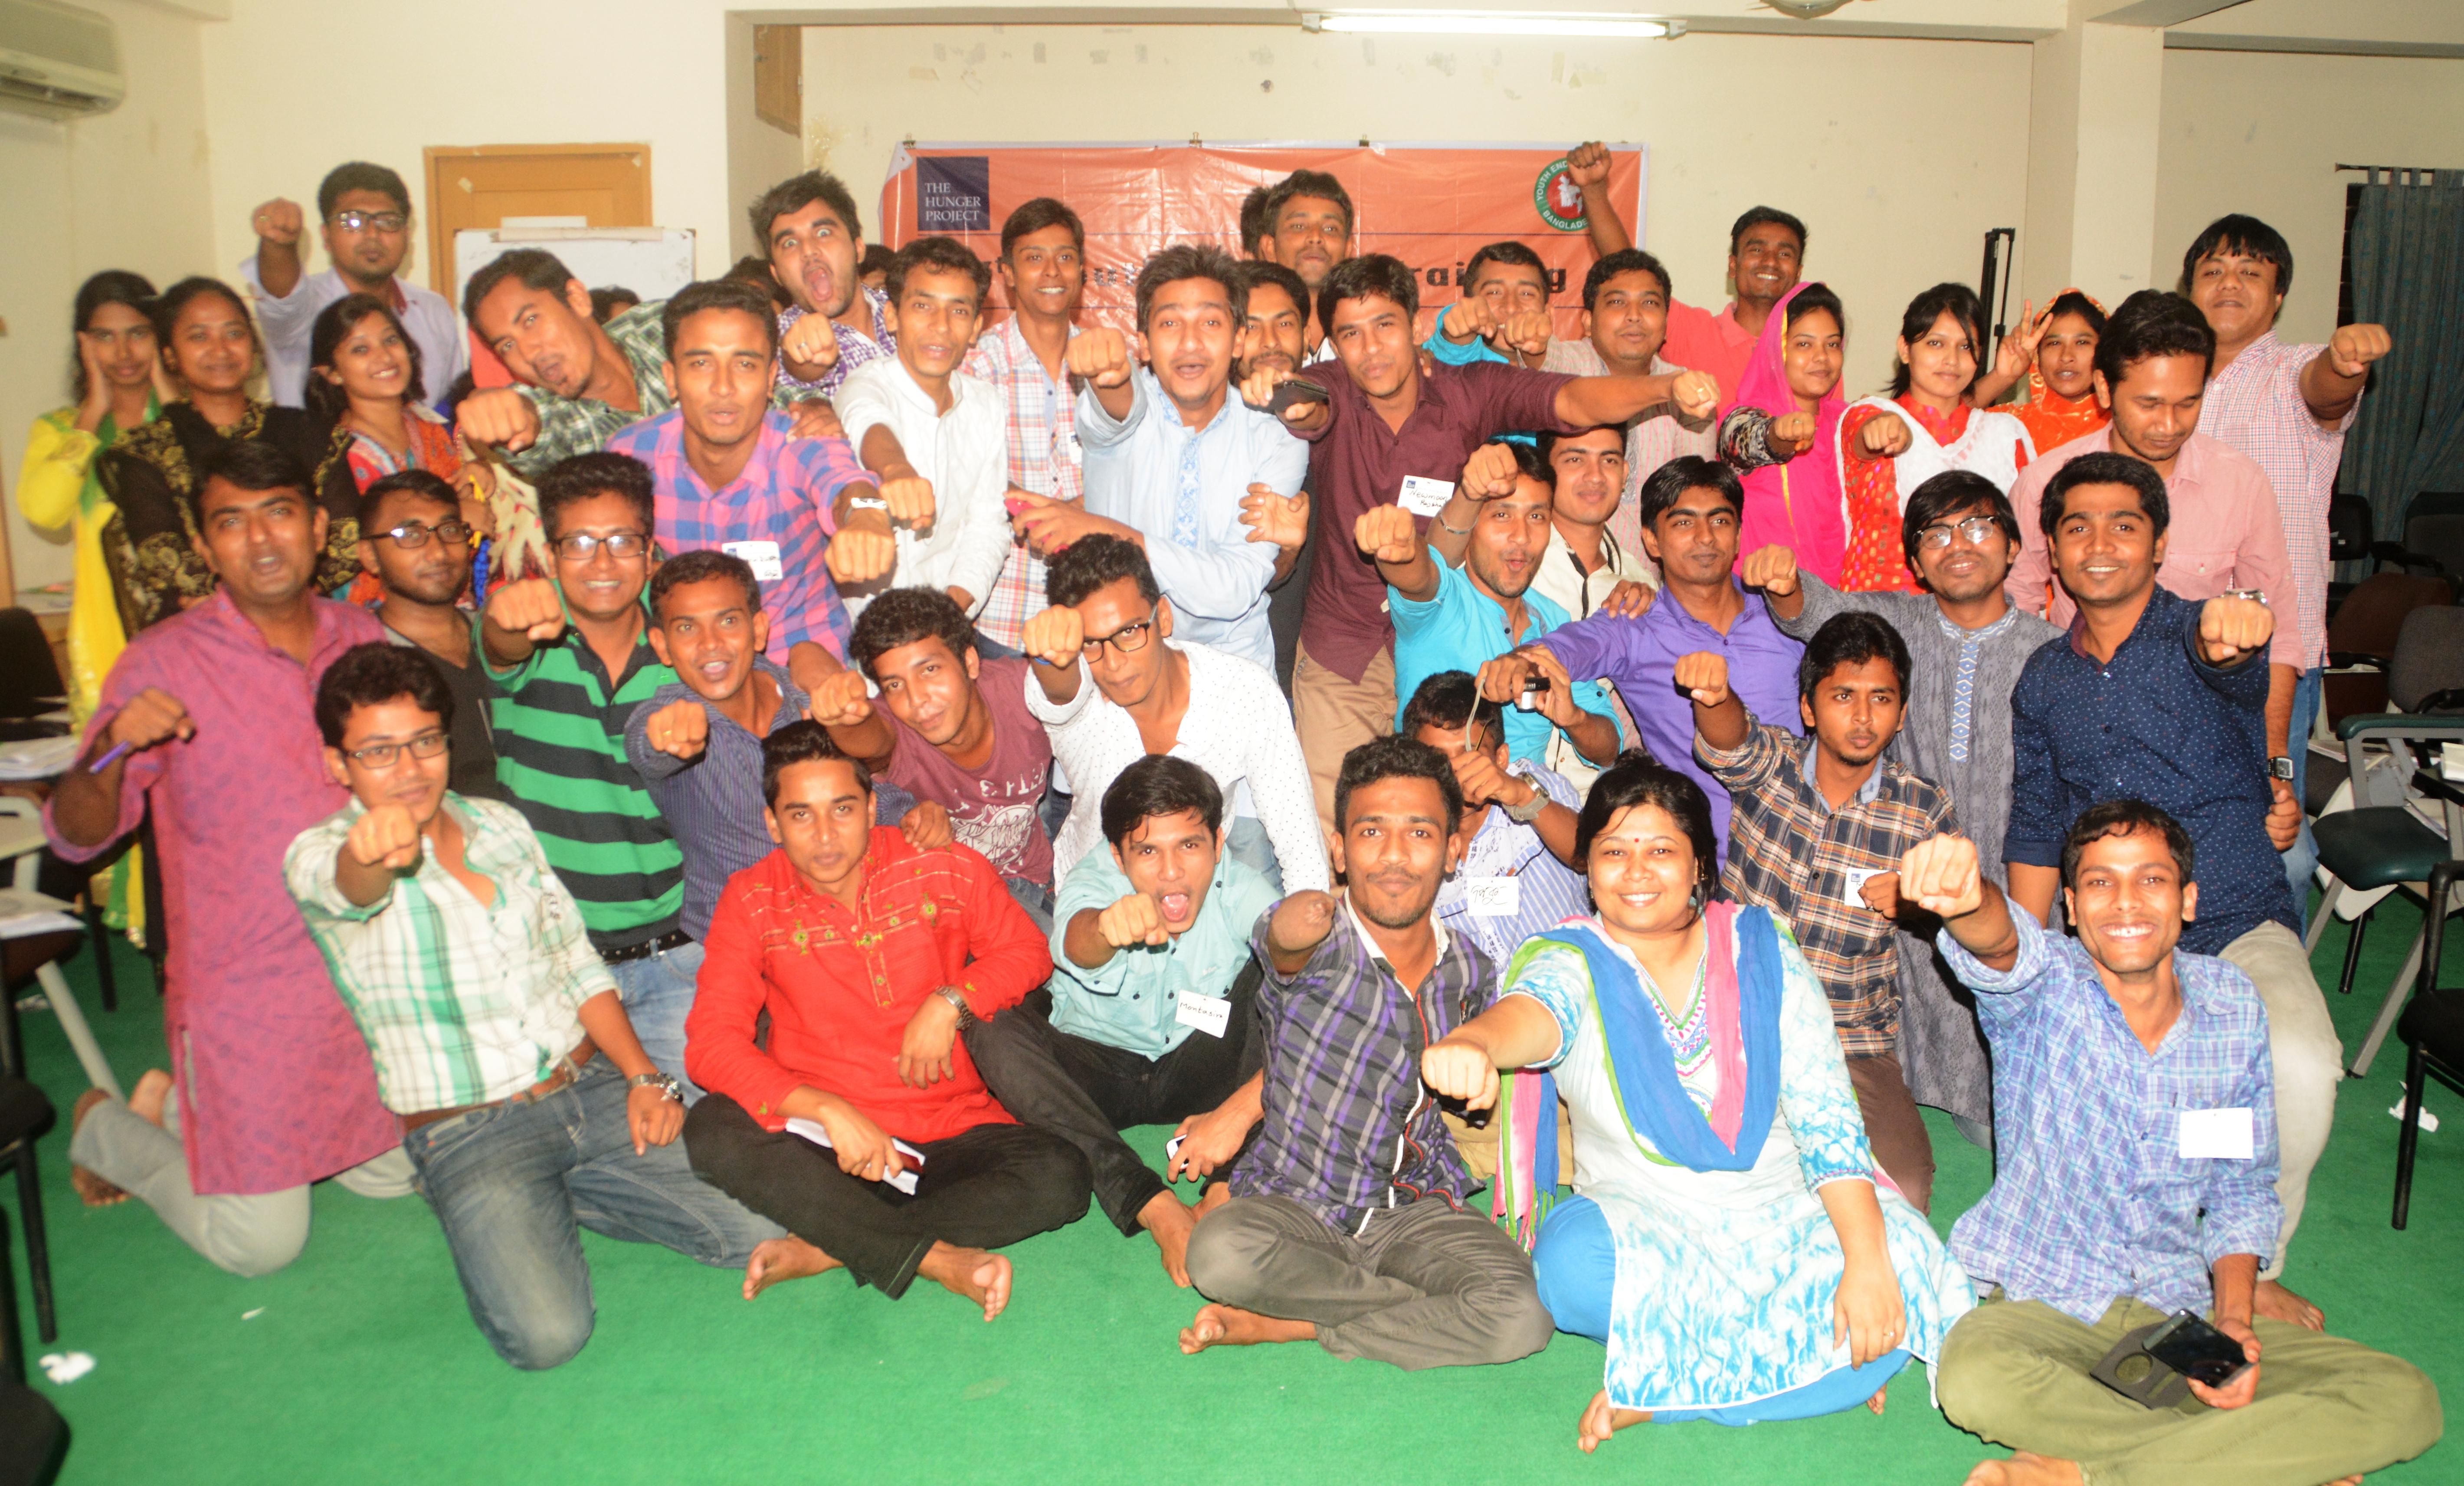 7th Youth Activist